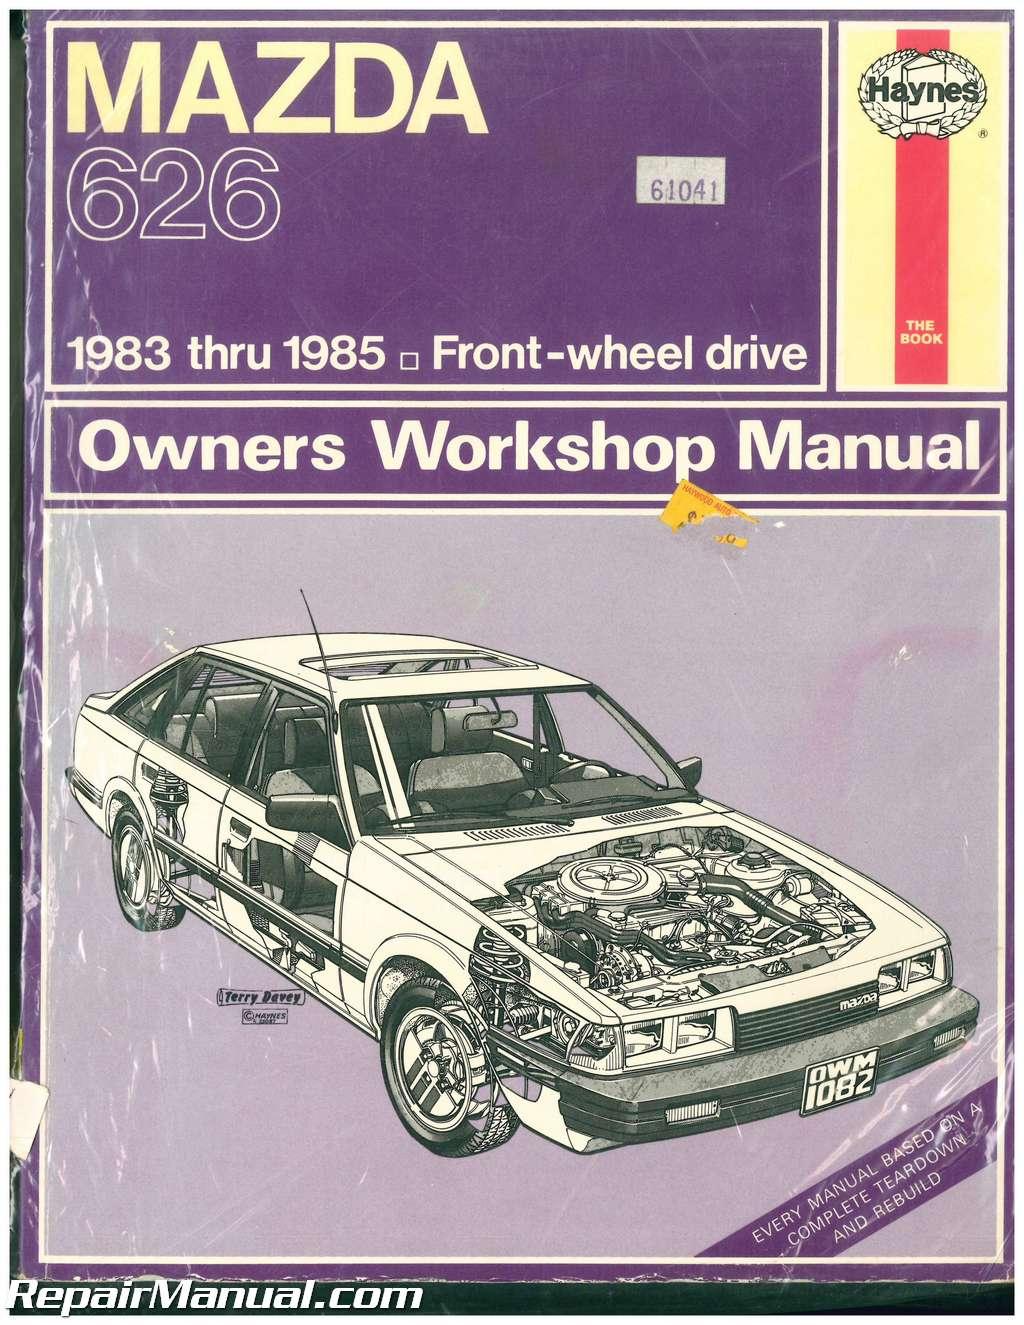 used haynes mazda 626 1983 1985 auto repair manual rh repairmanual com Haynes Repair Manual Online View Haynes Repair Manual Online View